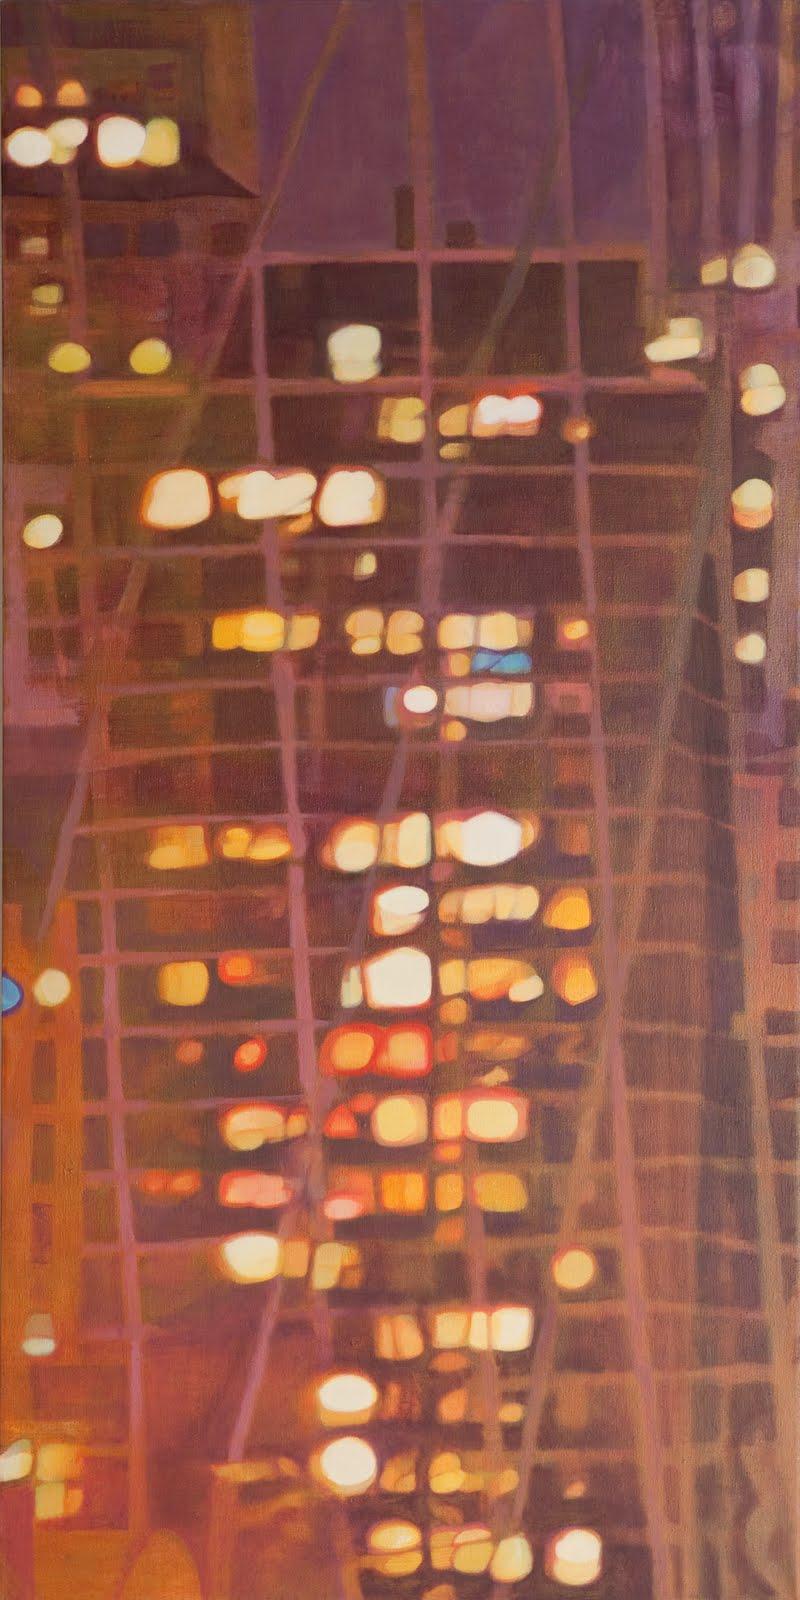 """From the Bridge II"", oil on linen, 44 x 22 x 2.5 in."